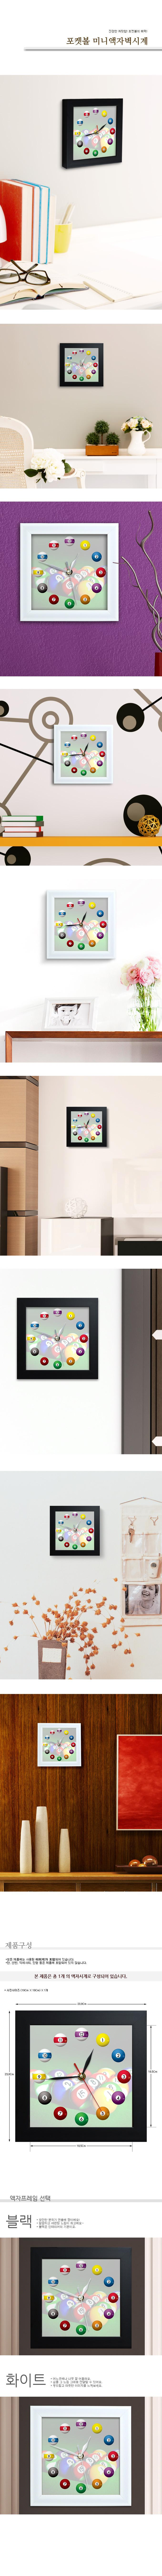 iy_307-포켓볼미니액자벽시계_디자인액자시계 - 꾸밈, 24,000원, 벽시계, 디자인벽시계